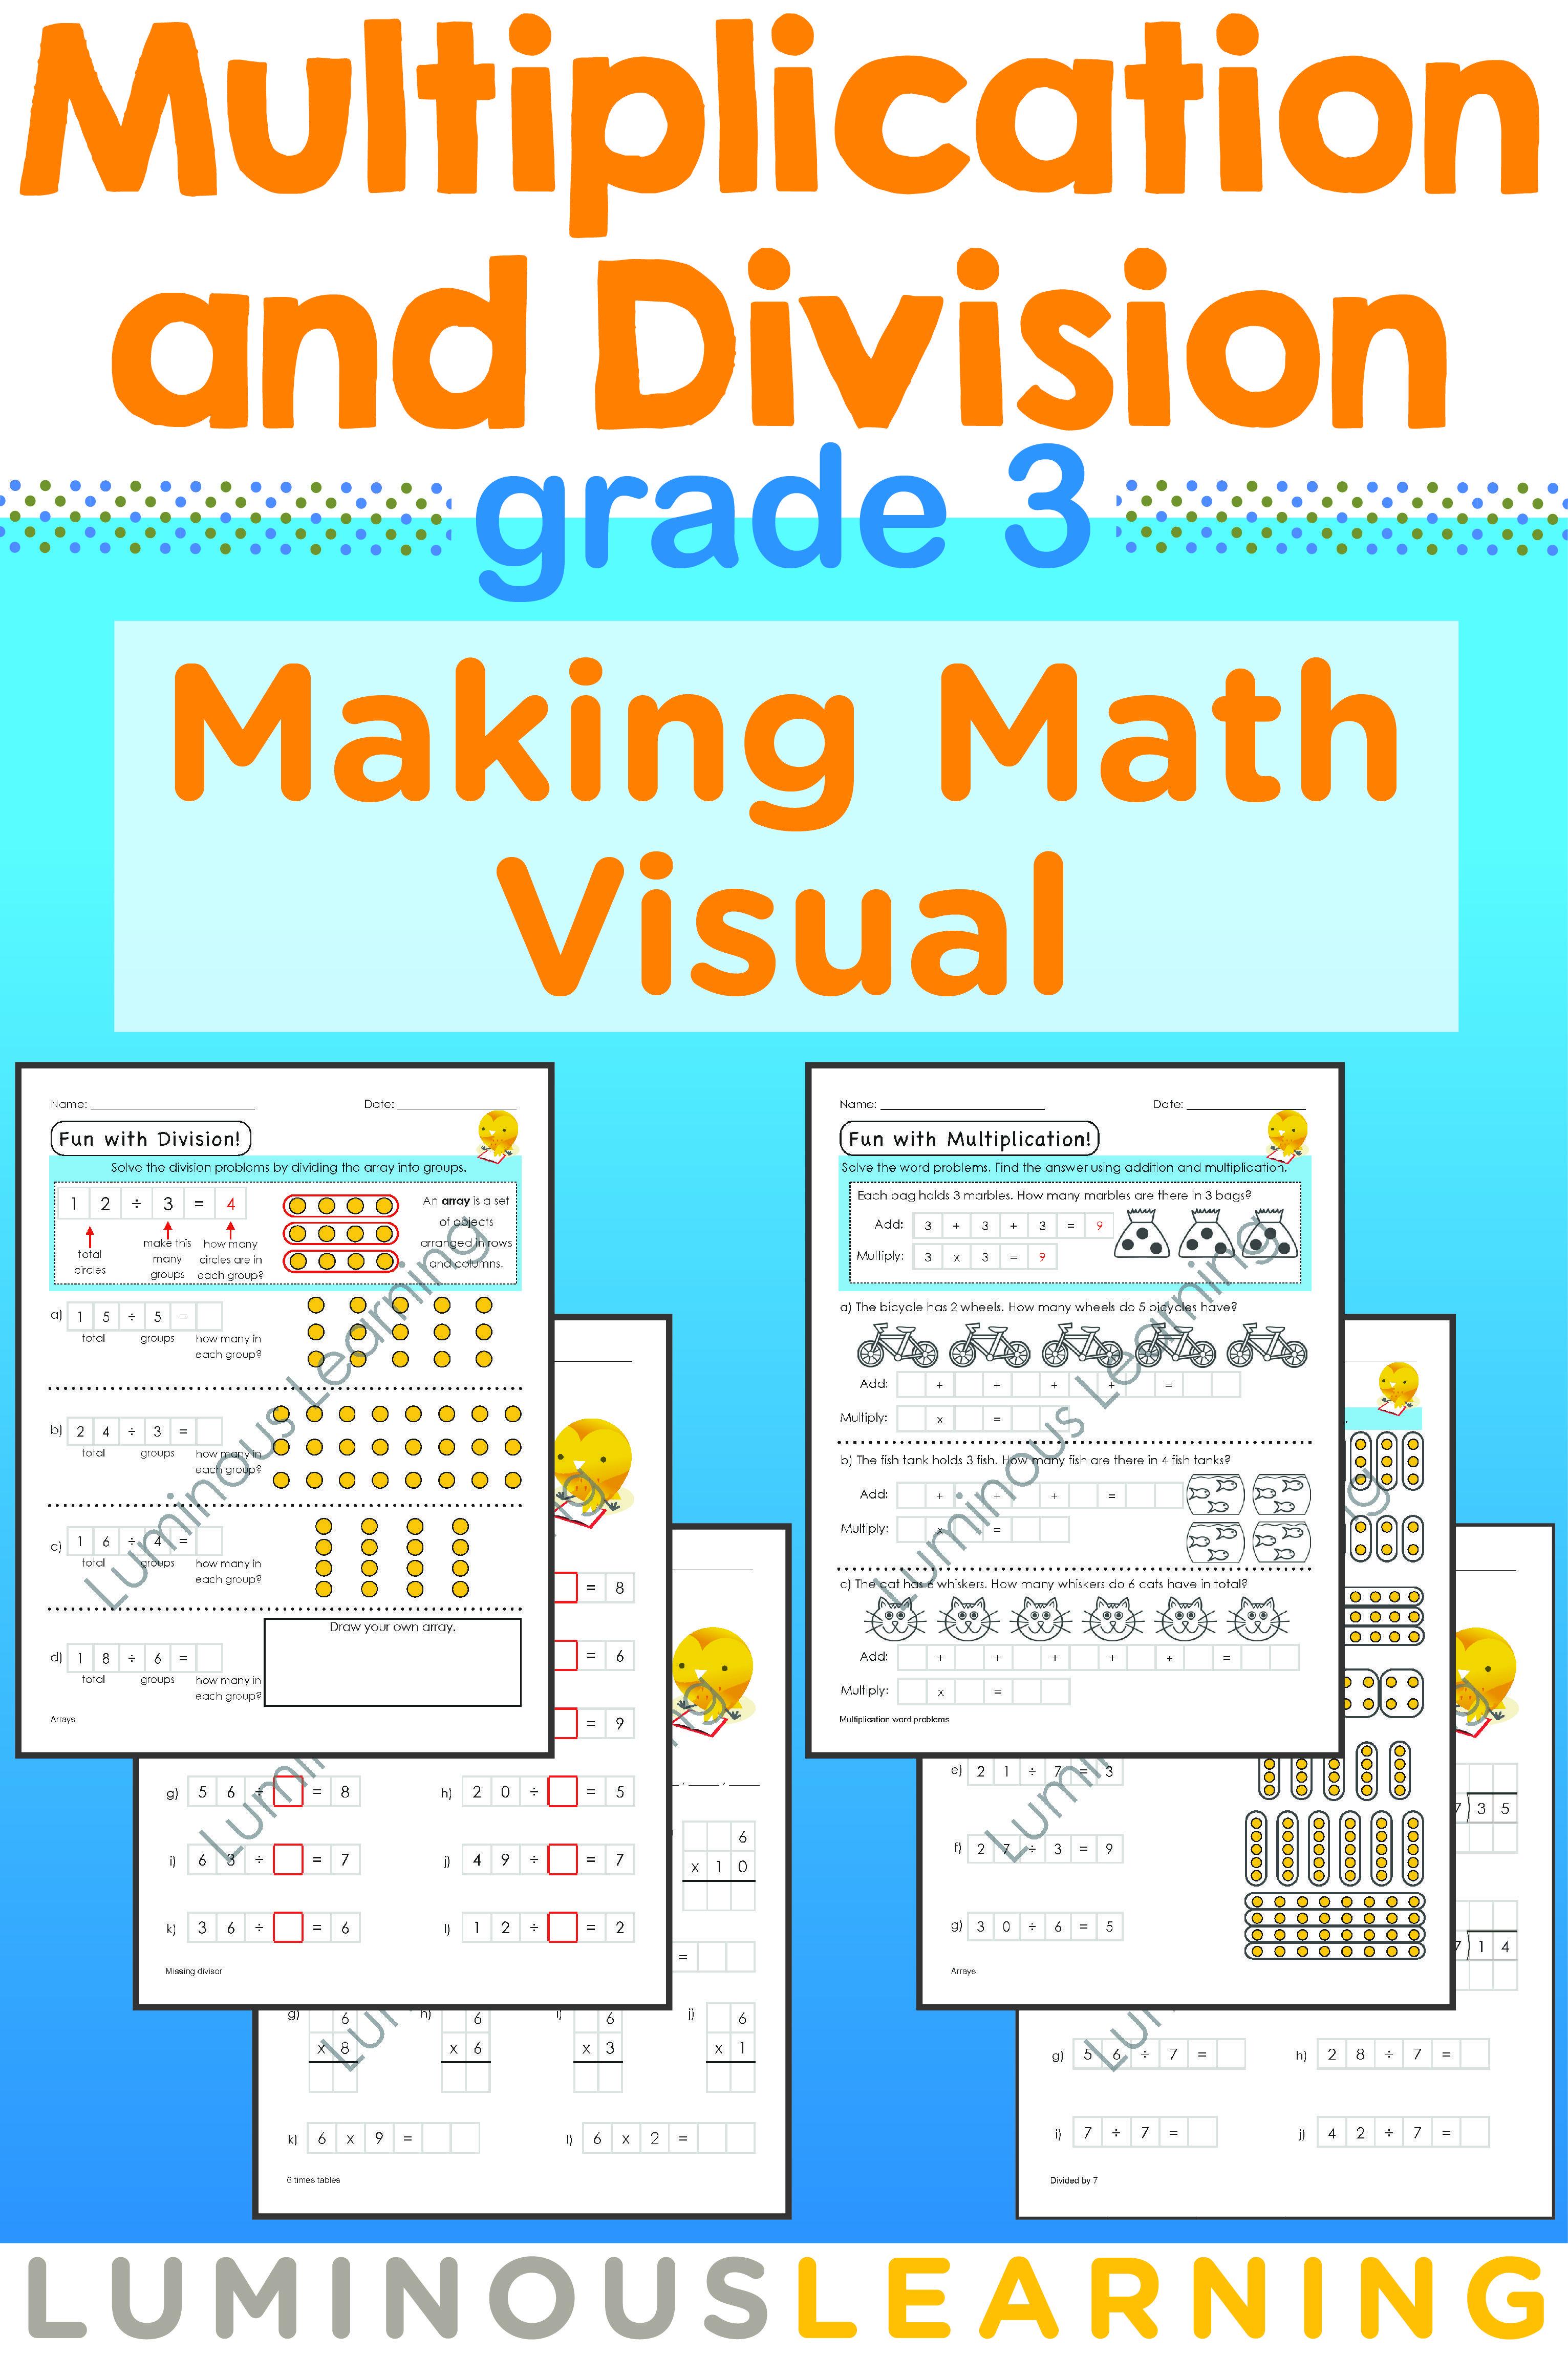 Grade 3 Multiplication and Division Workbook: Making Math Visual ...